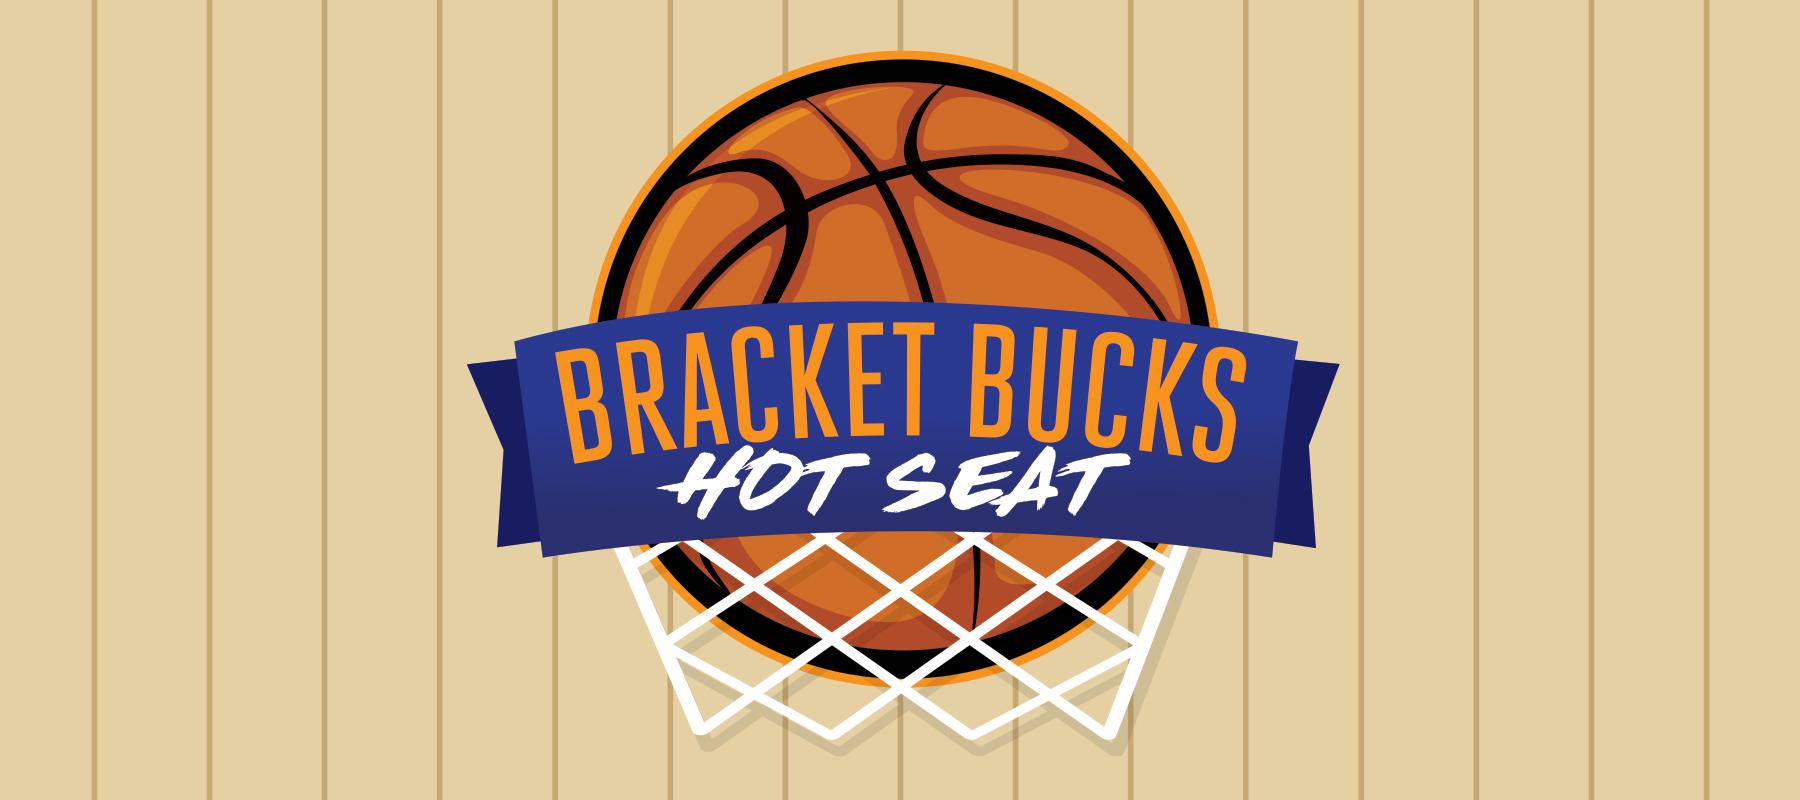 Bracket Bucks Hot Seat